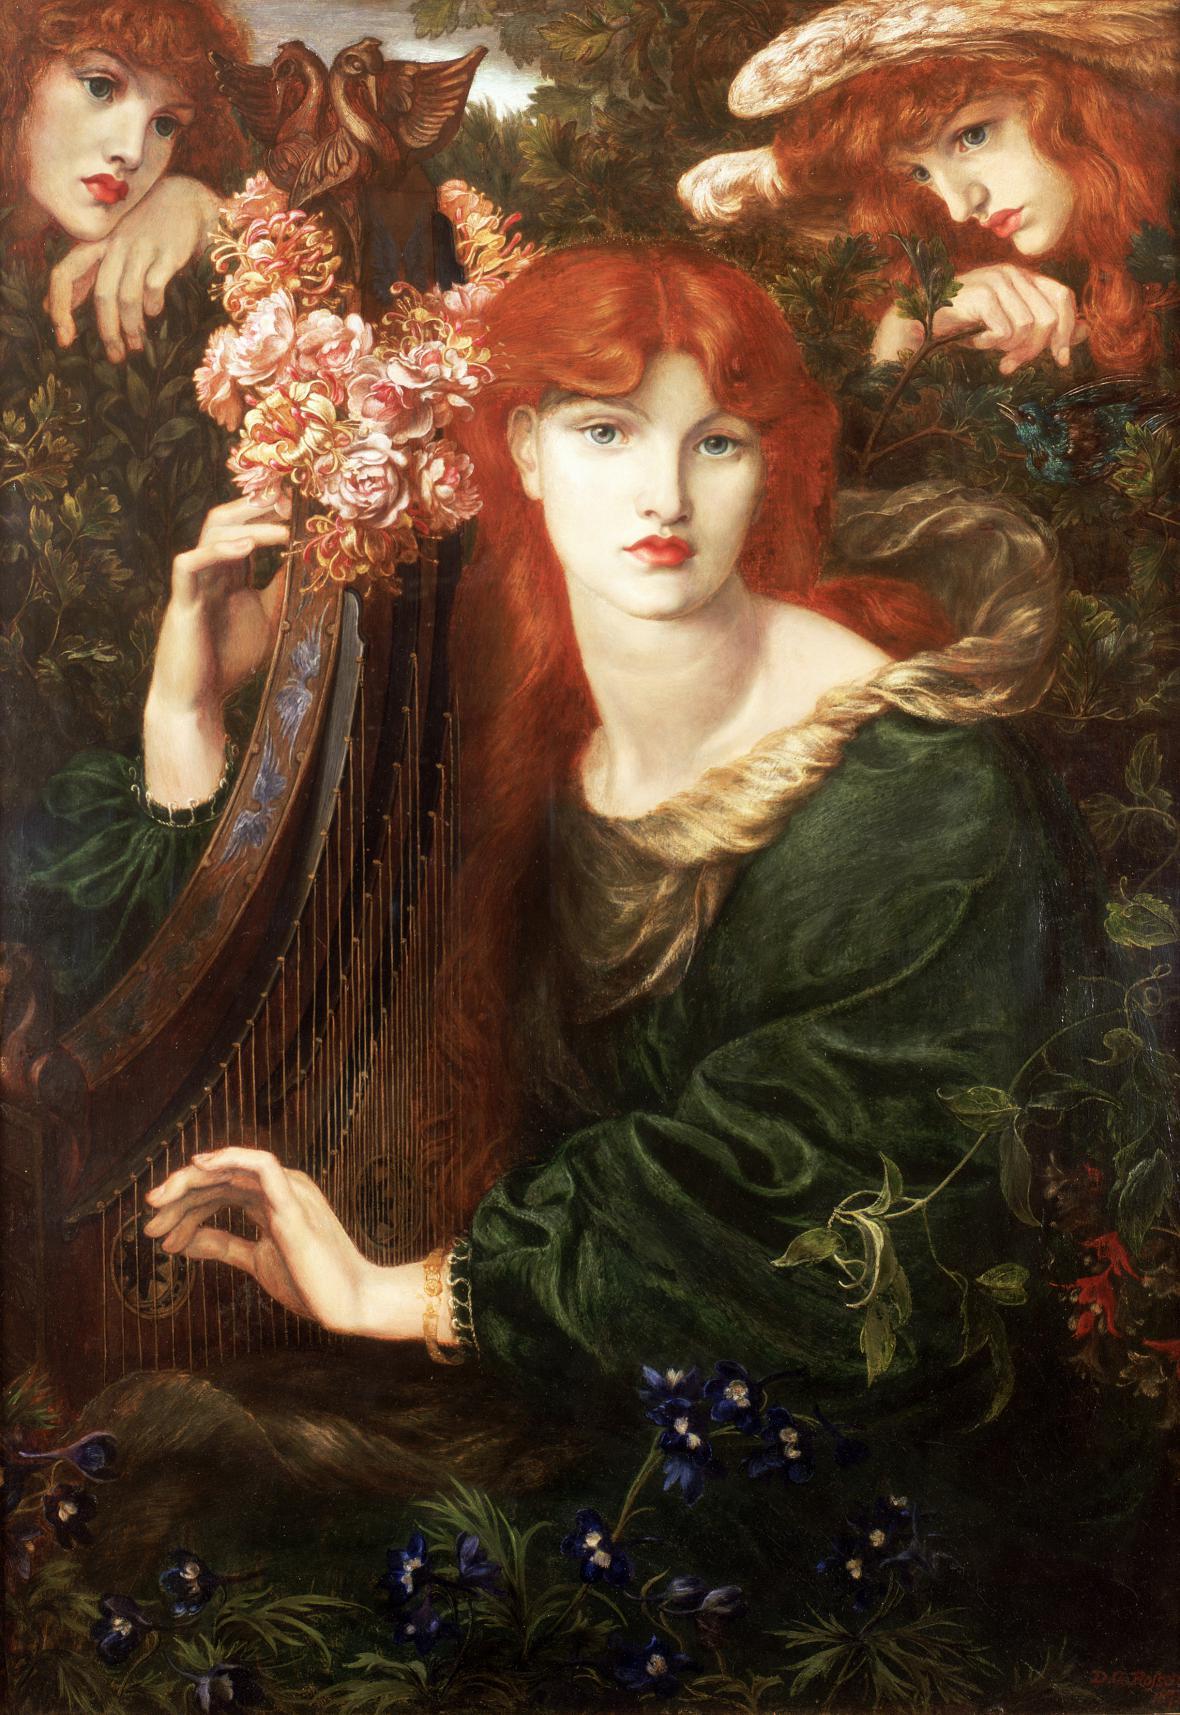 Dante Gabriel Rossetti / La Ghirlandata, 1873